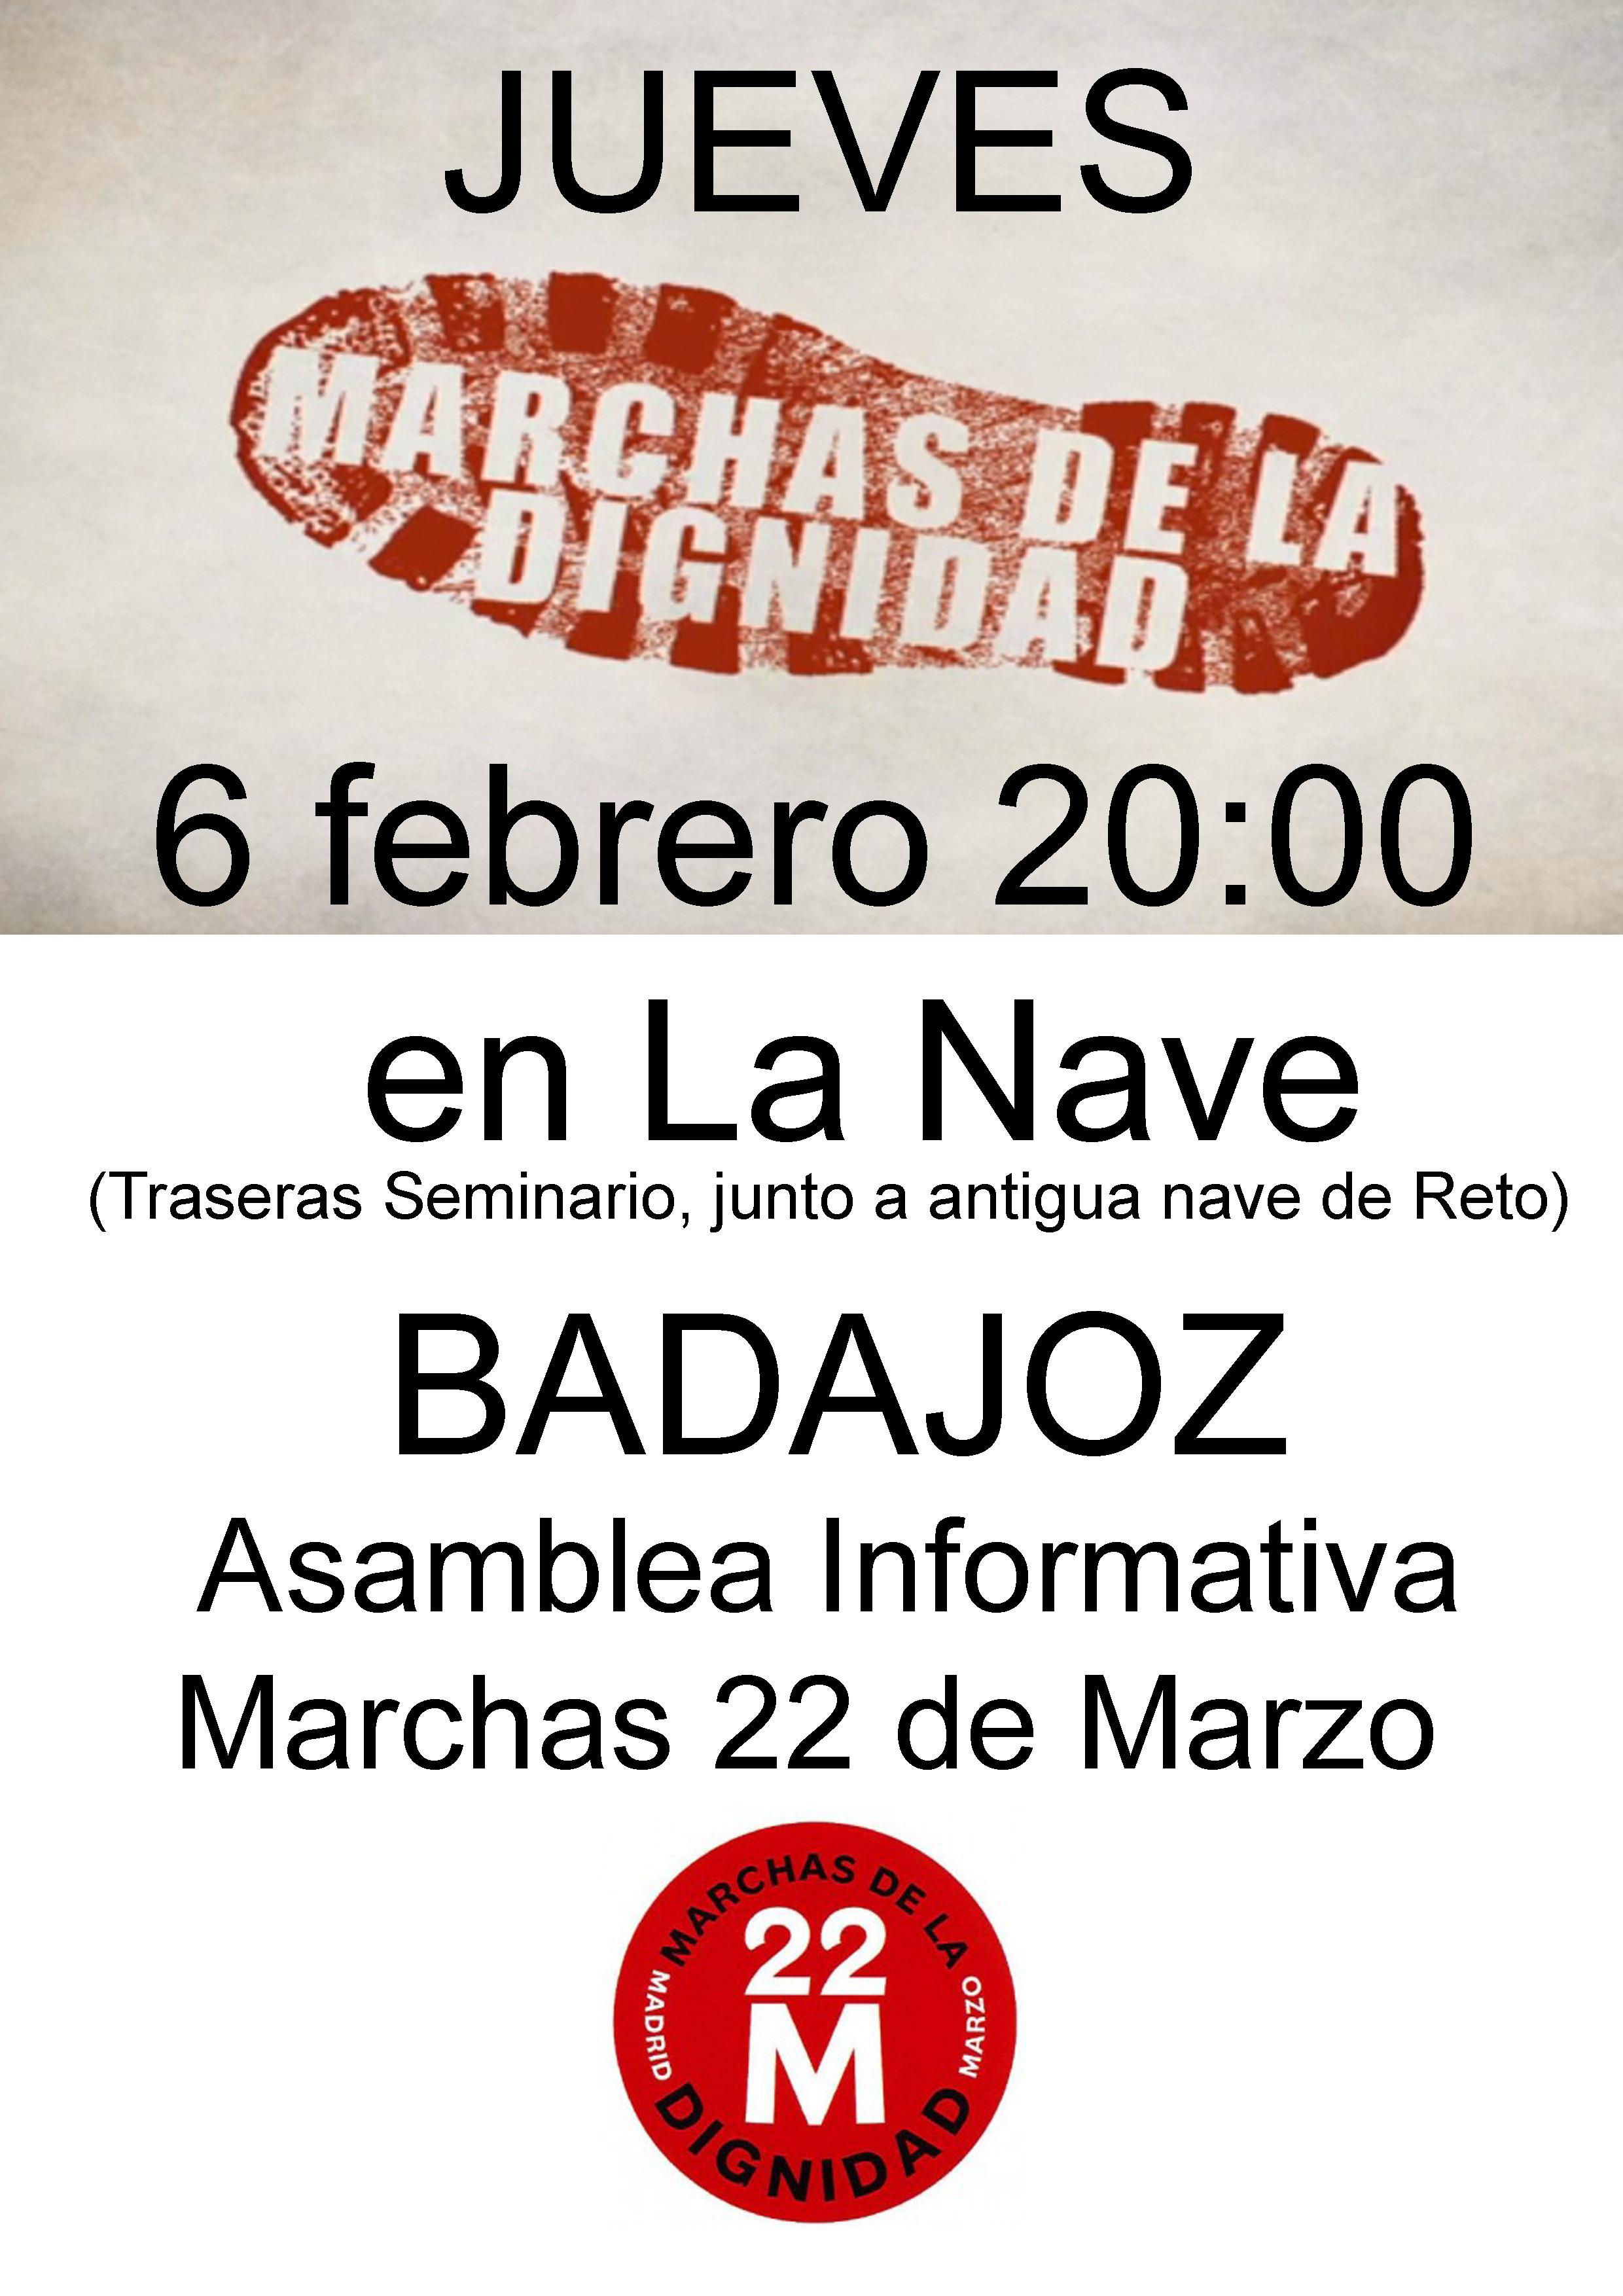 http://acampadabadajoz.files.wordpress.com/2014/01/cartel-asamblea-marchas-22m.jpg